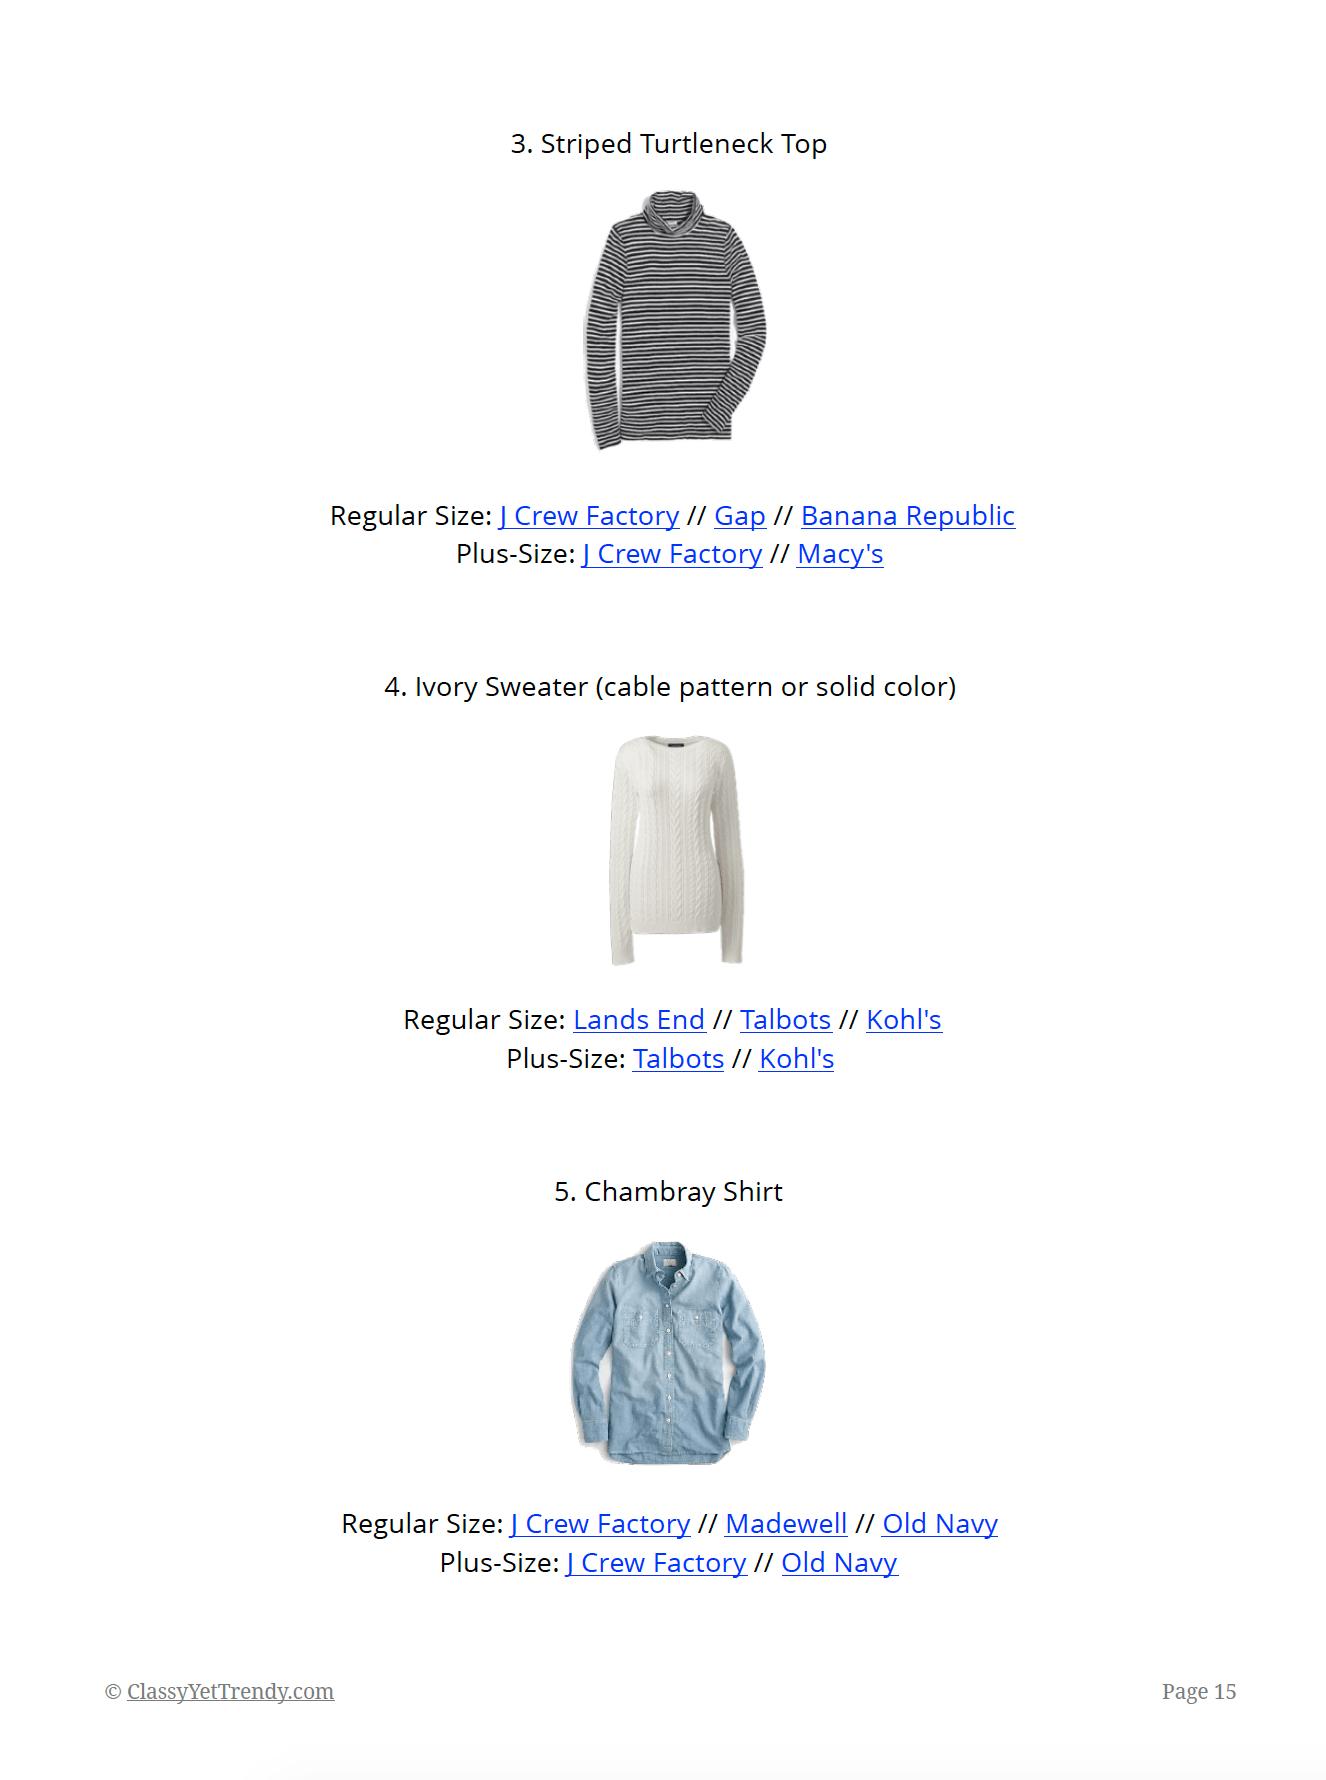 The Essential Capsule Wardrobe: Winter 2018/2019